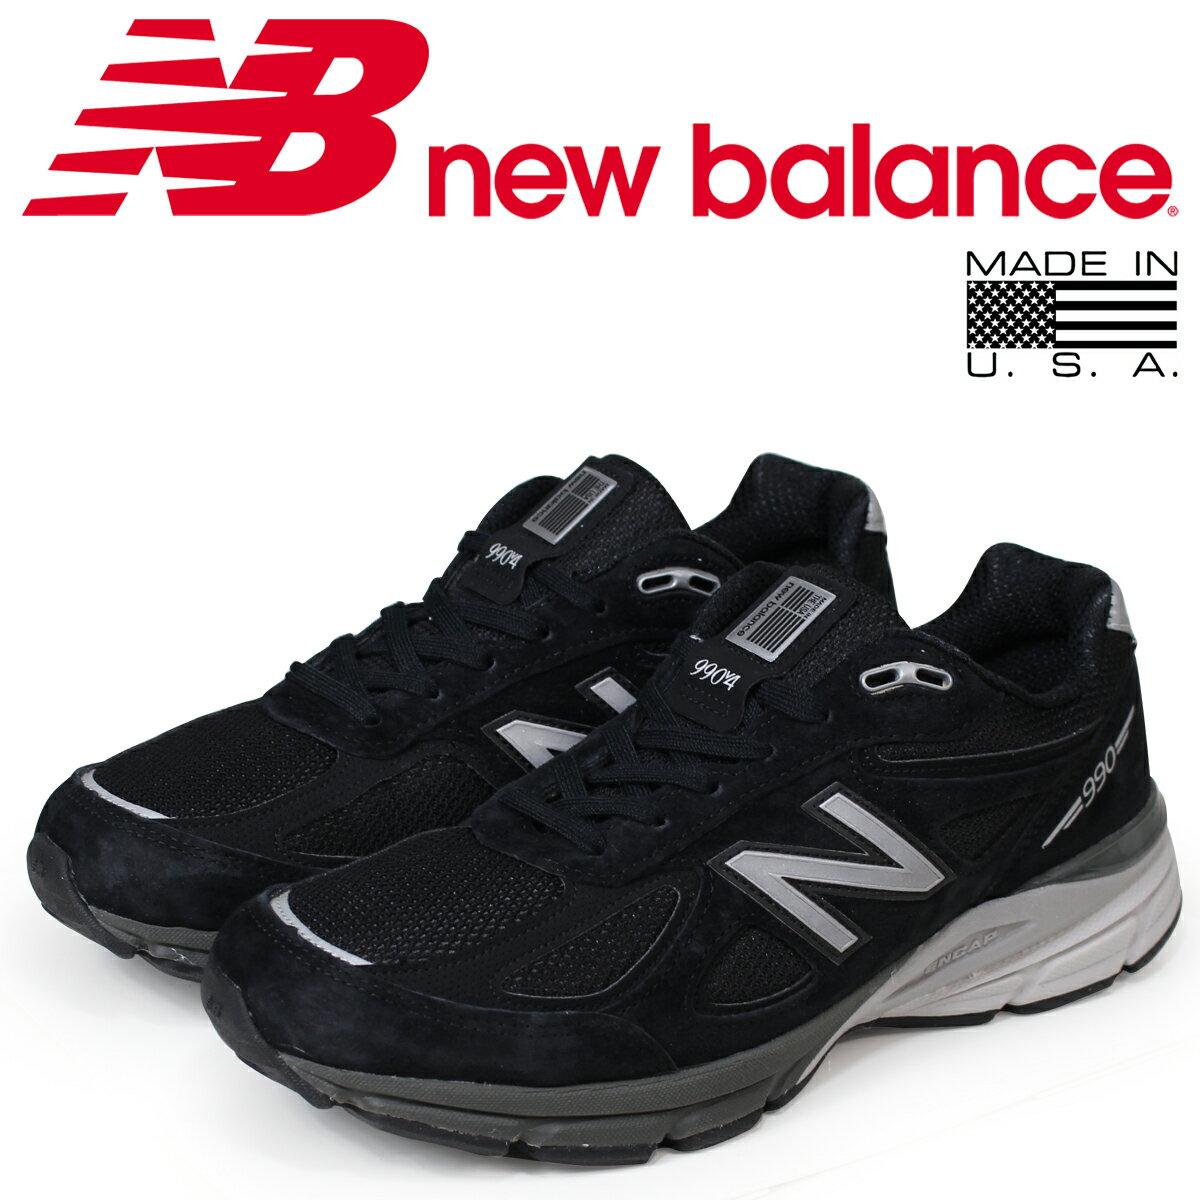 new balance 990 メンズ ニューバランス スニーカー M990BK4 Dワイズ MADE IN USA 靴 ブラック [予約商品 7/19頃入荷予定 追加入荷]